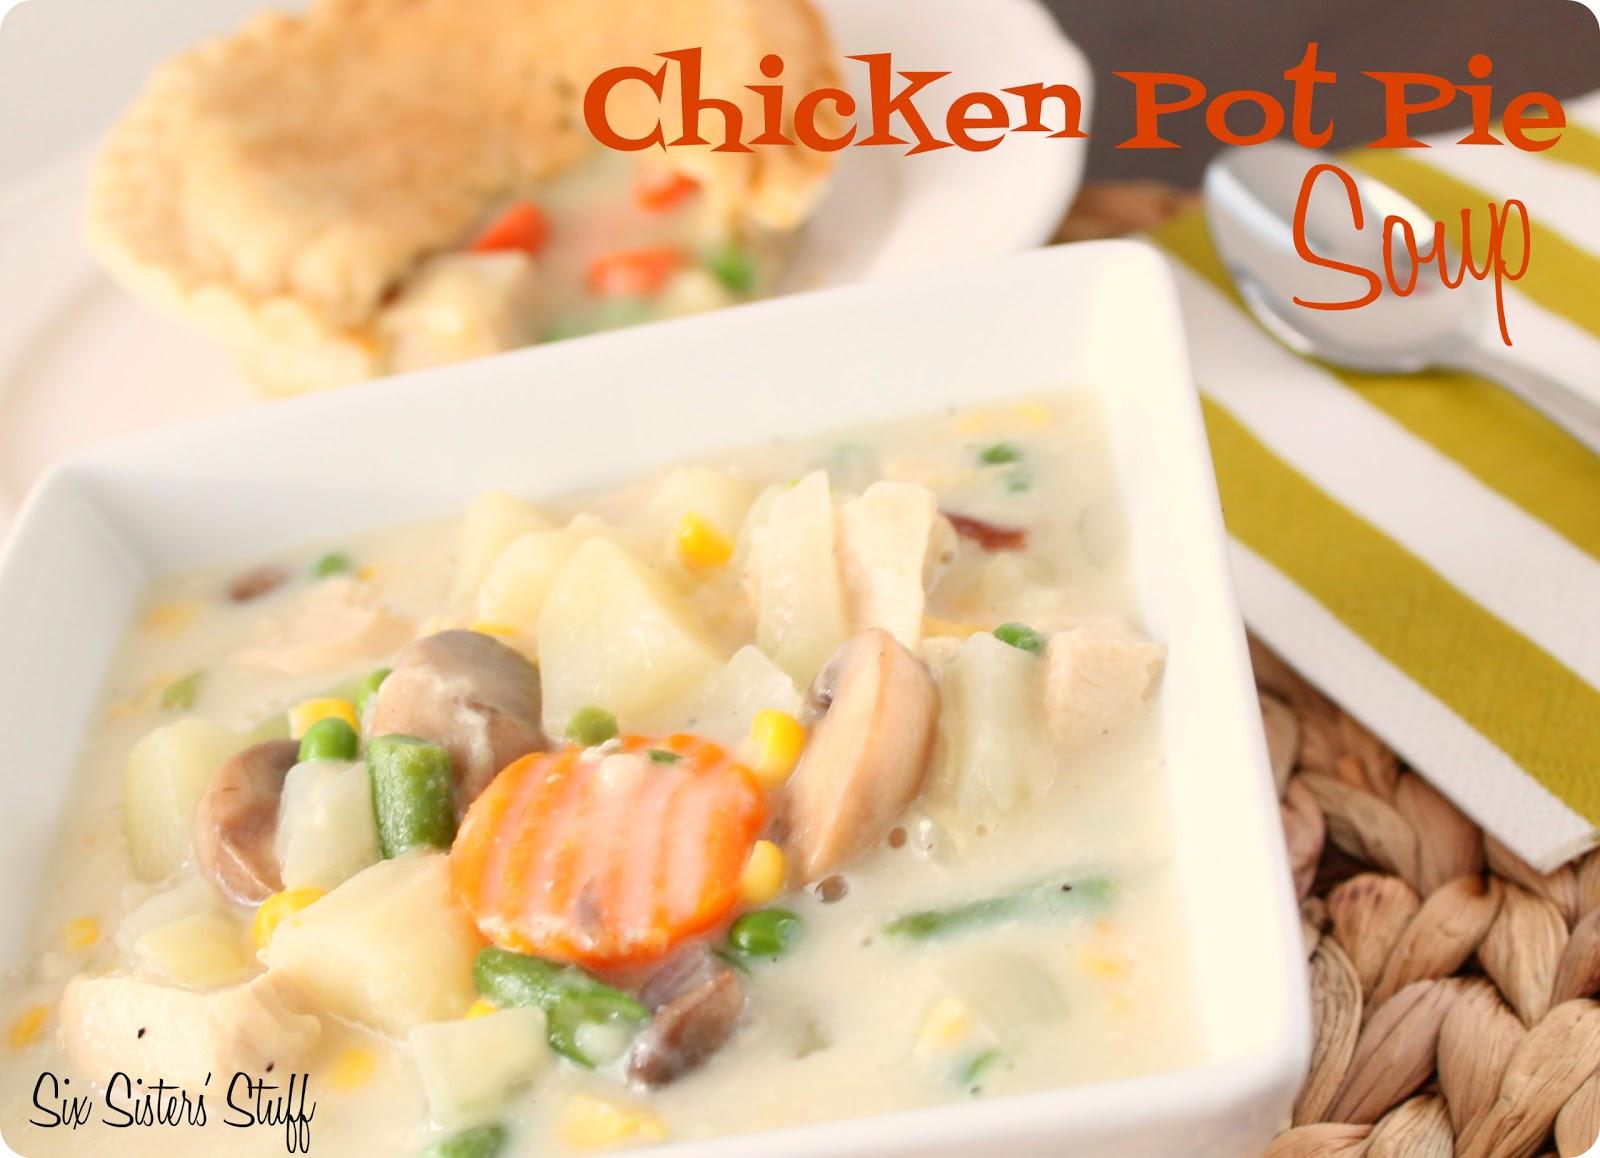 Chicken Pot Pie Soup Recipe  Chicken Pot Pie Soup Recipe